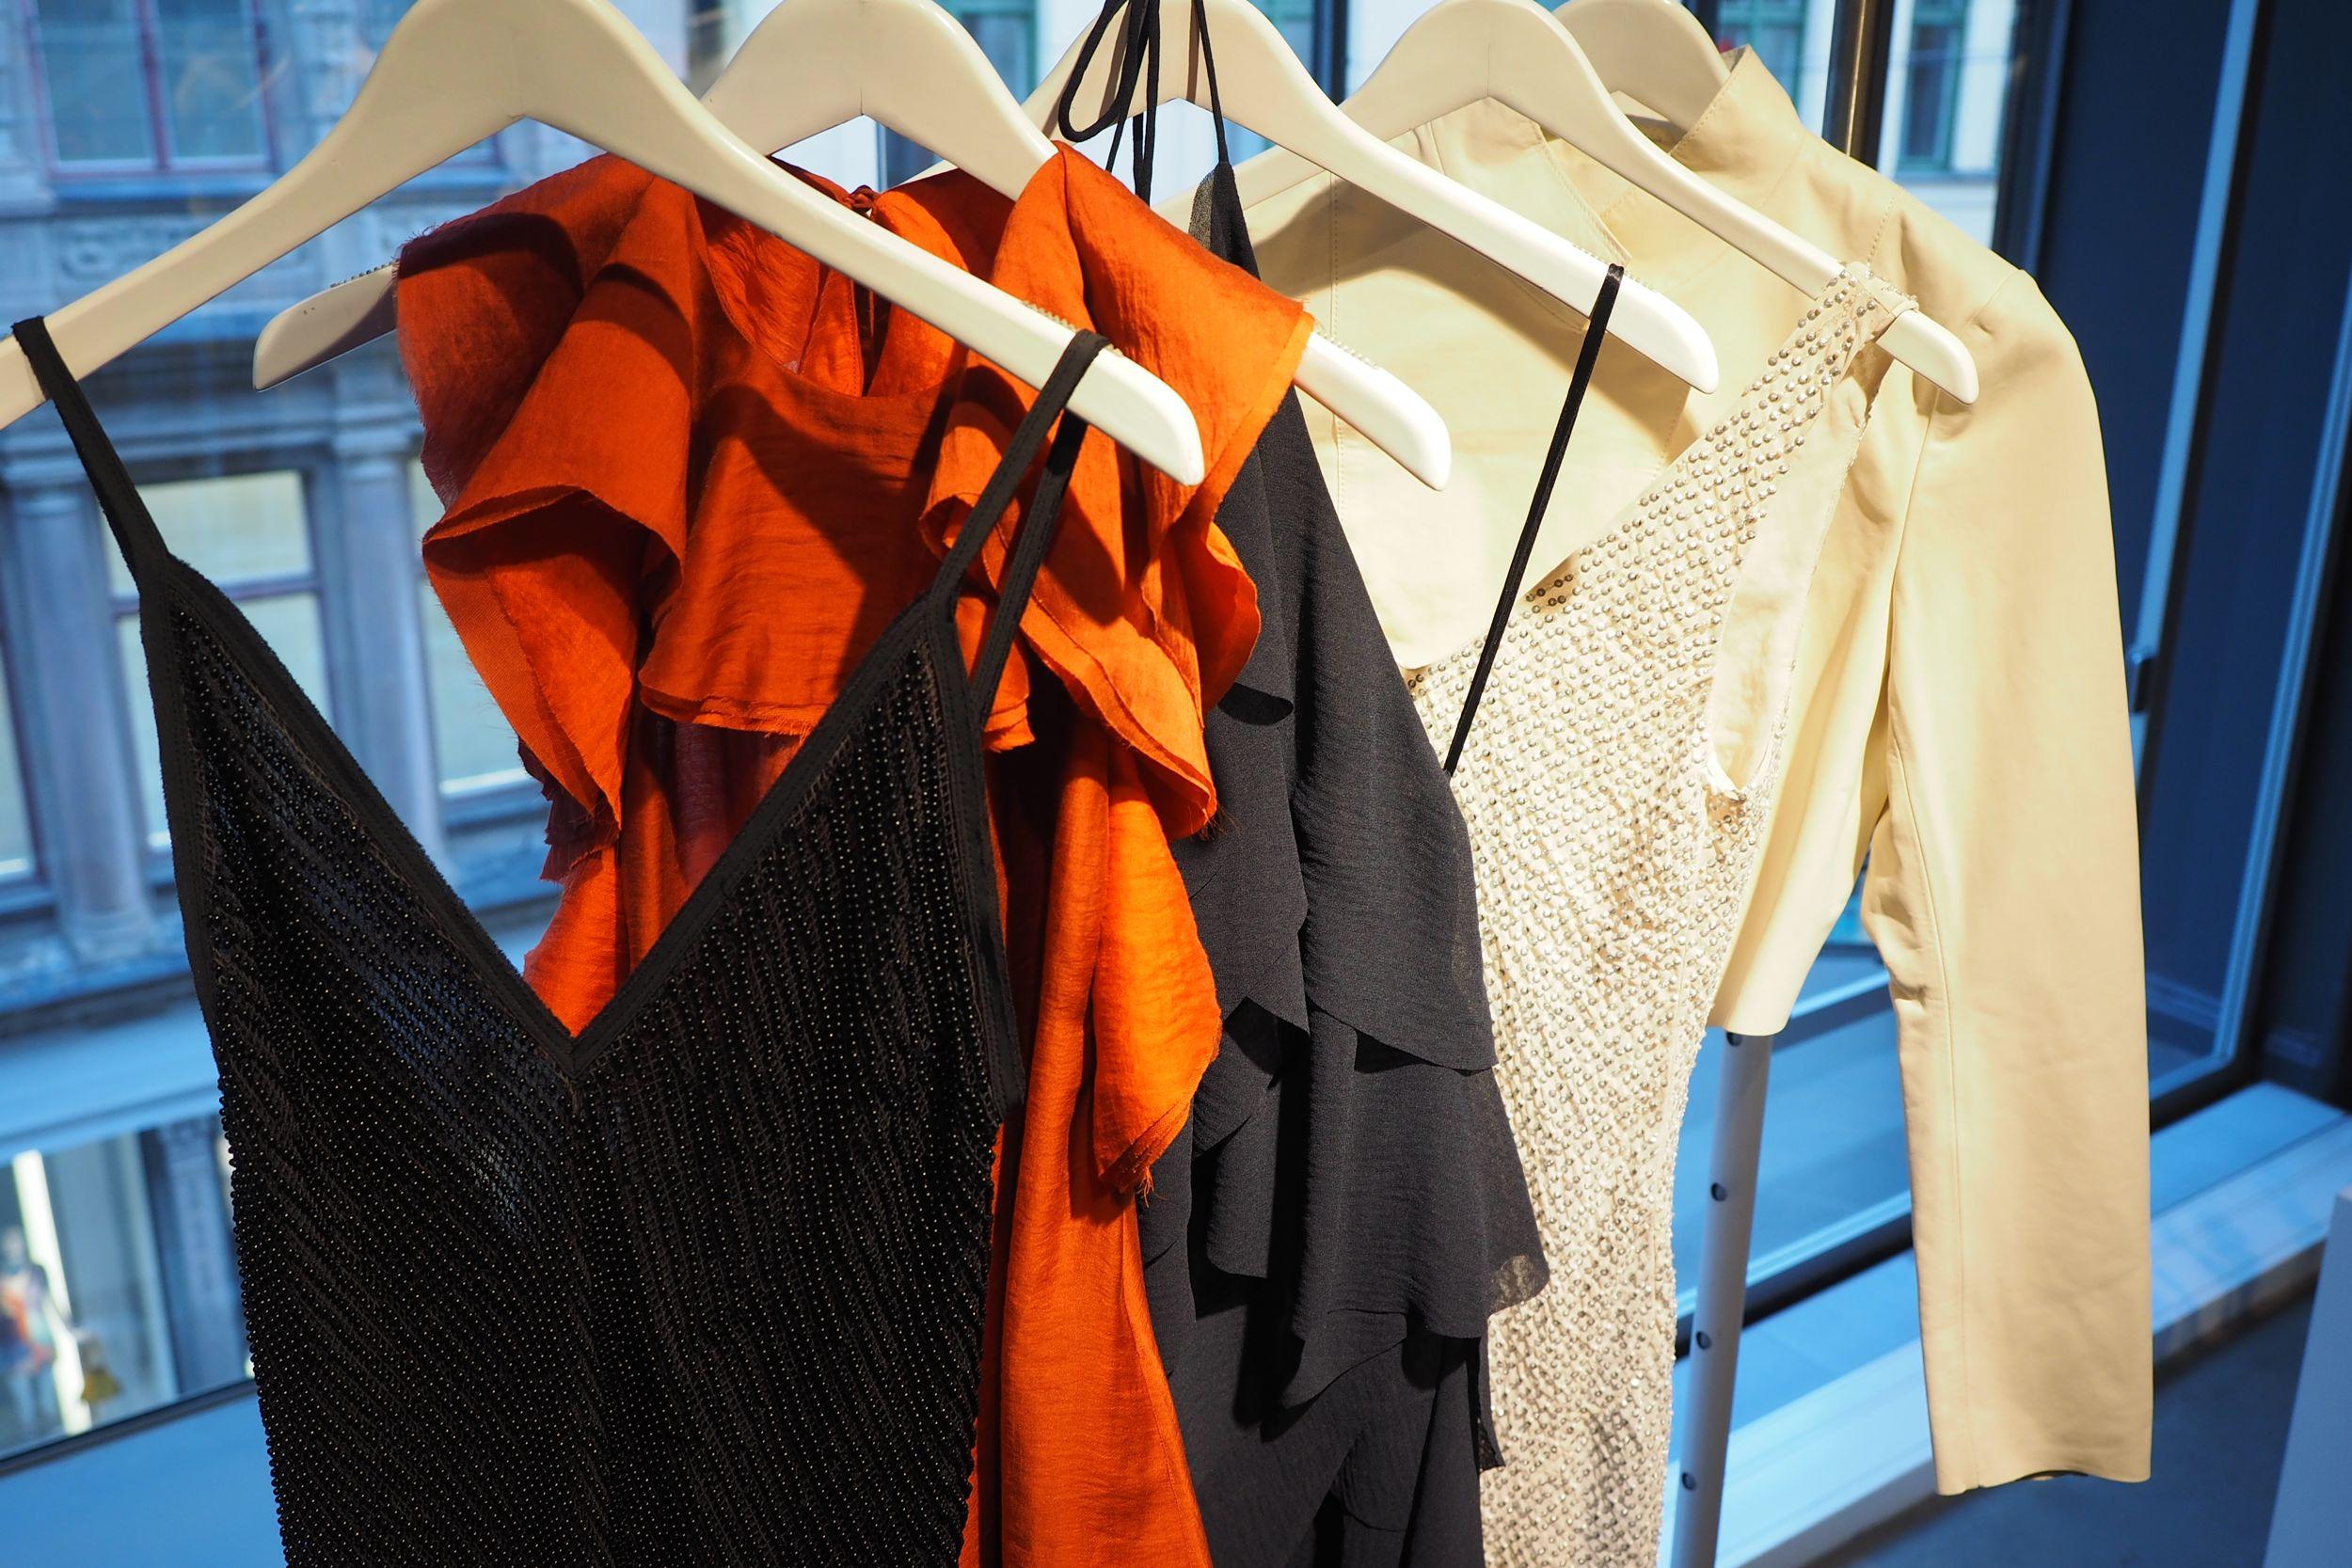 h&m, h&m conscious exclusive, stockholm h&m showroom, billur saatci, off ne giysem, street style